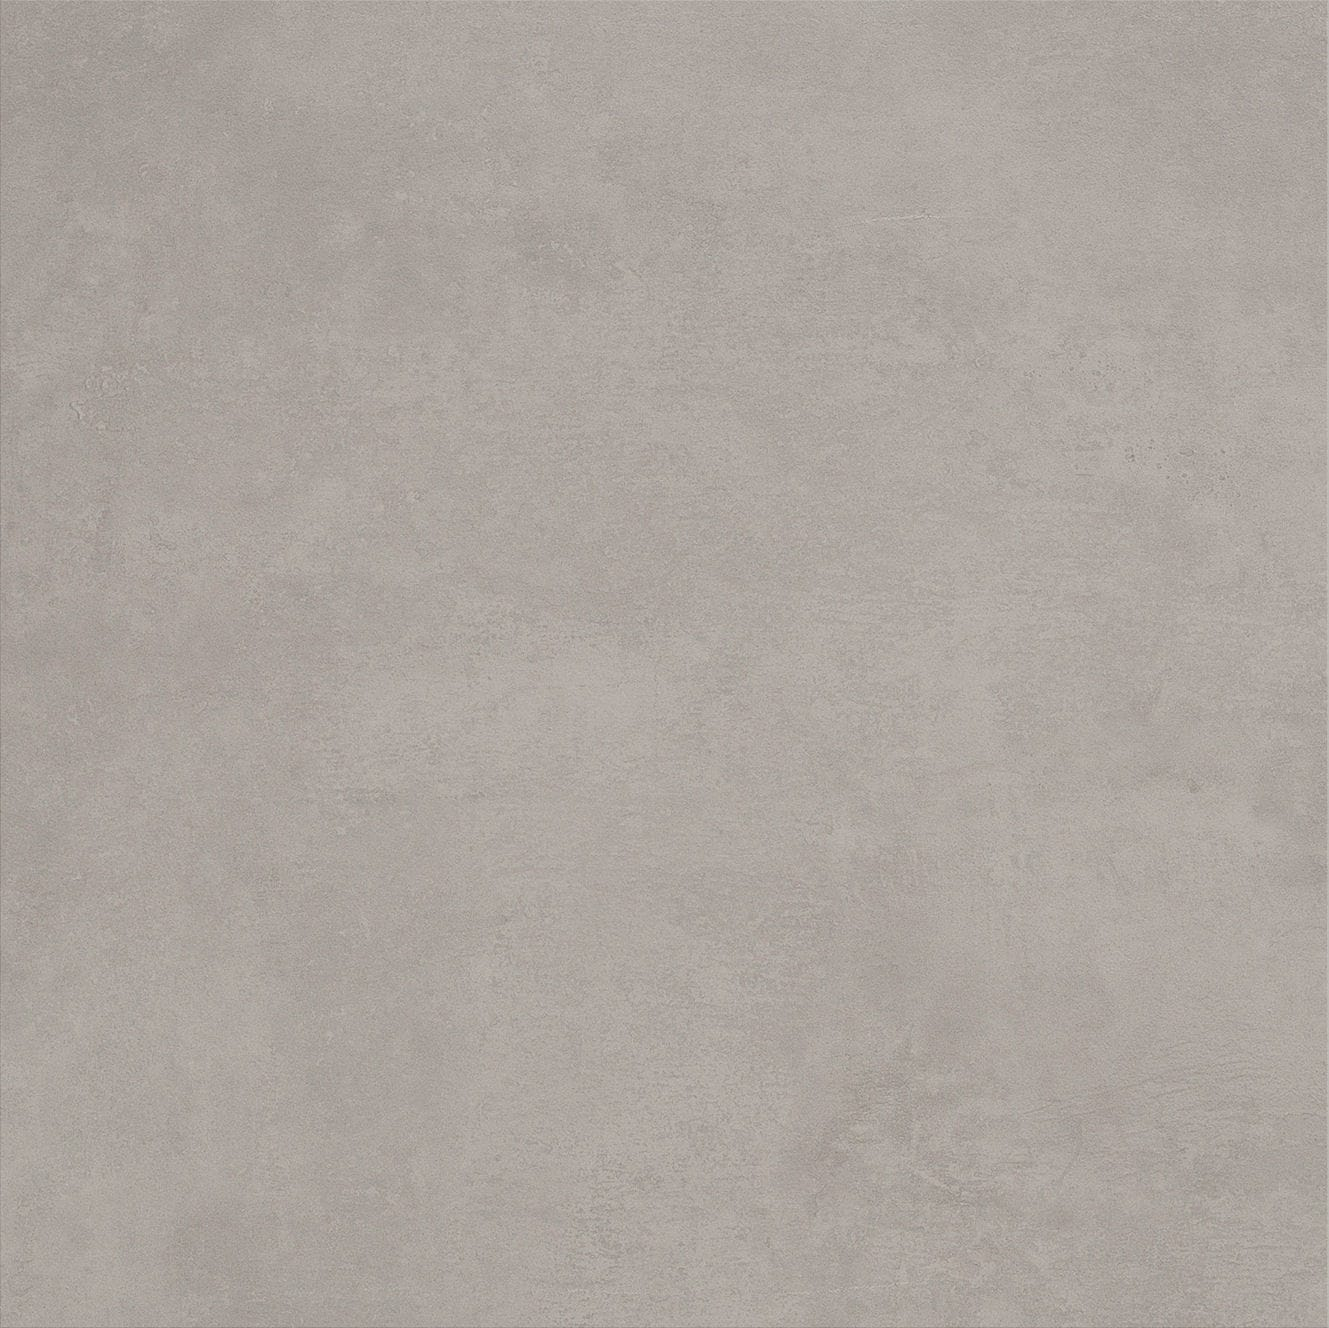 Concrete effect porcelain tiles mandarin stone cemento light grey matt porcelain dailygadgetfo Image collections